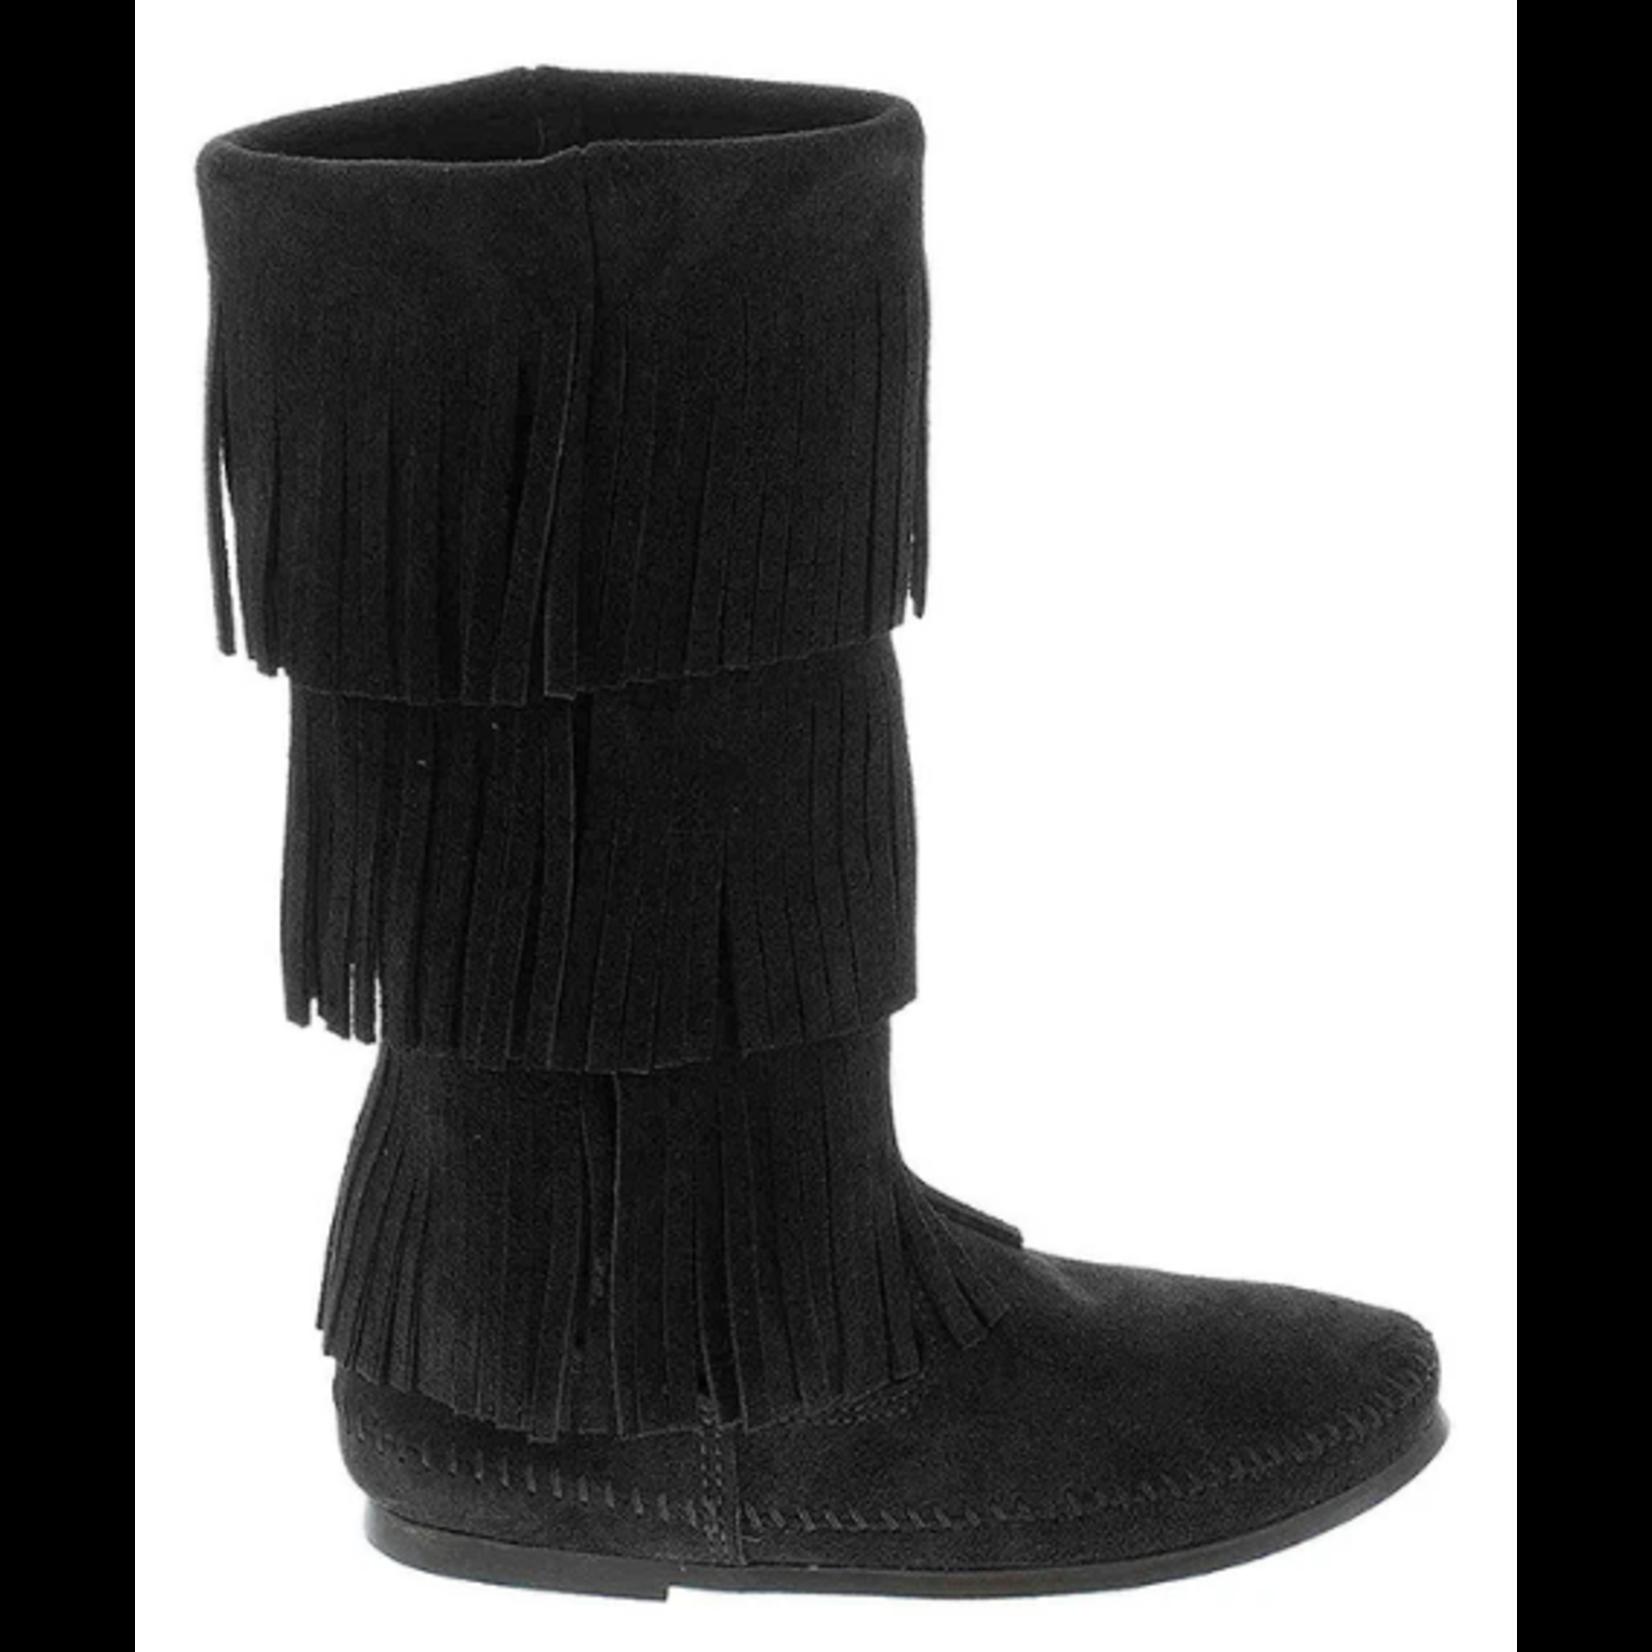 Minnetonka Women's Minnetonka 3 Layer Fringe Boot Black 1639